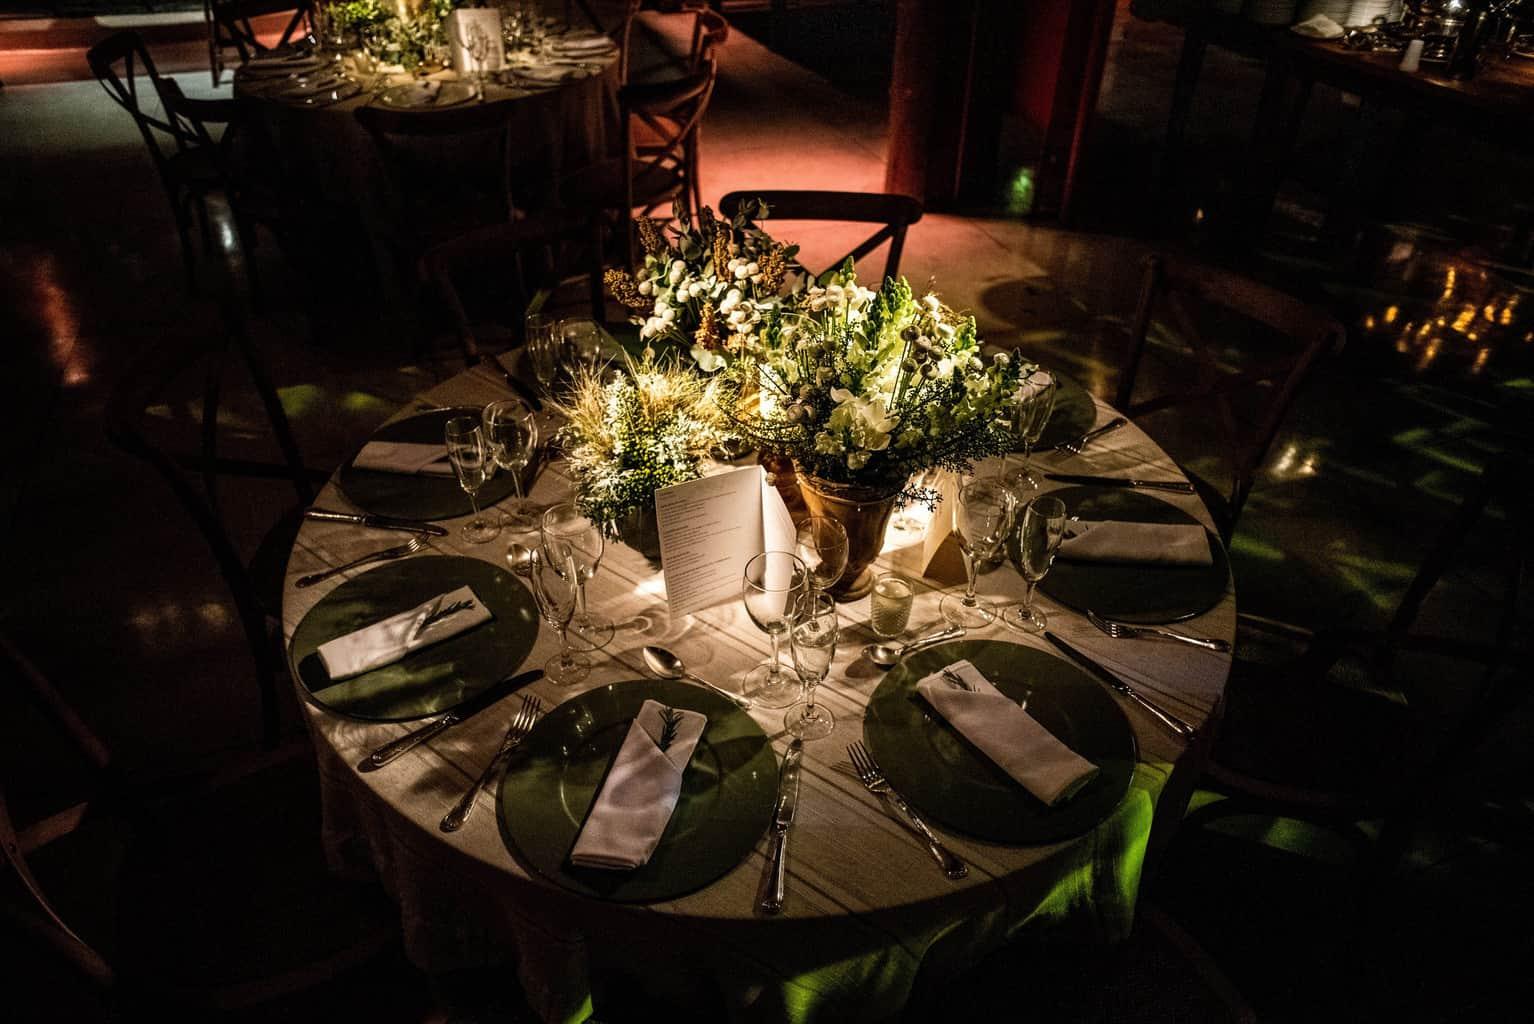 Bel-Benkler-eventos-Casamento-Ariane-e-Matheus-cerimonia-decoracao-contemporanea-fotografia-Rafael-Bigarelli-noivos-na-pista-Spazio-Giardini-48